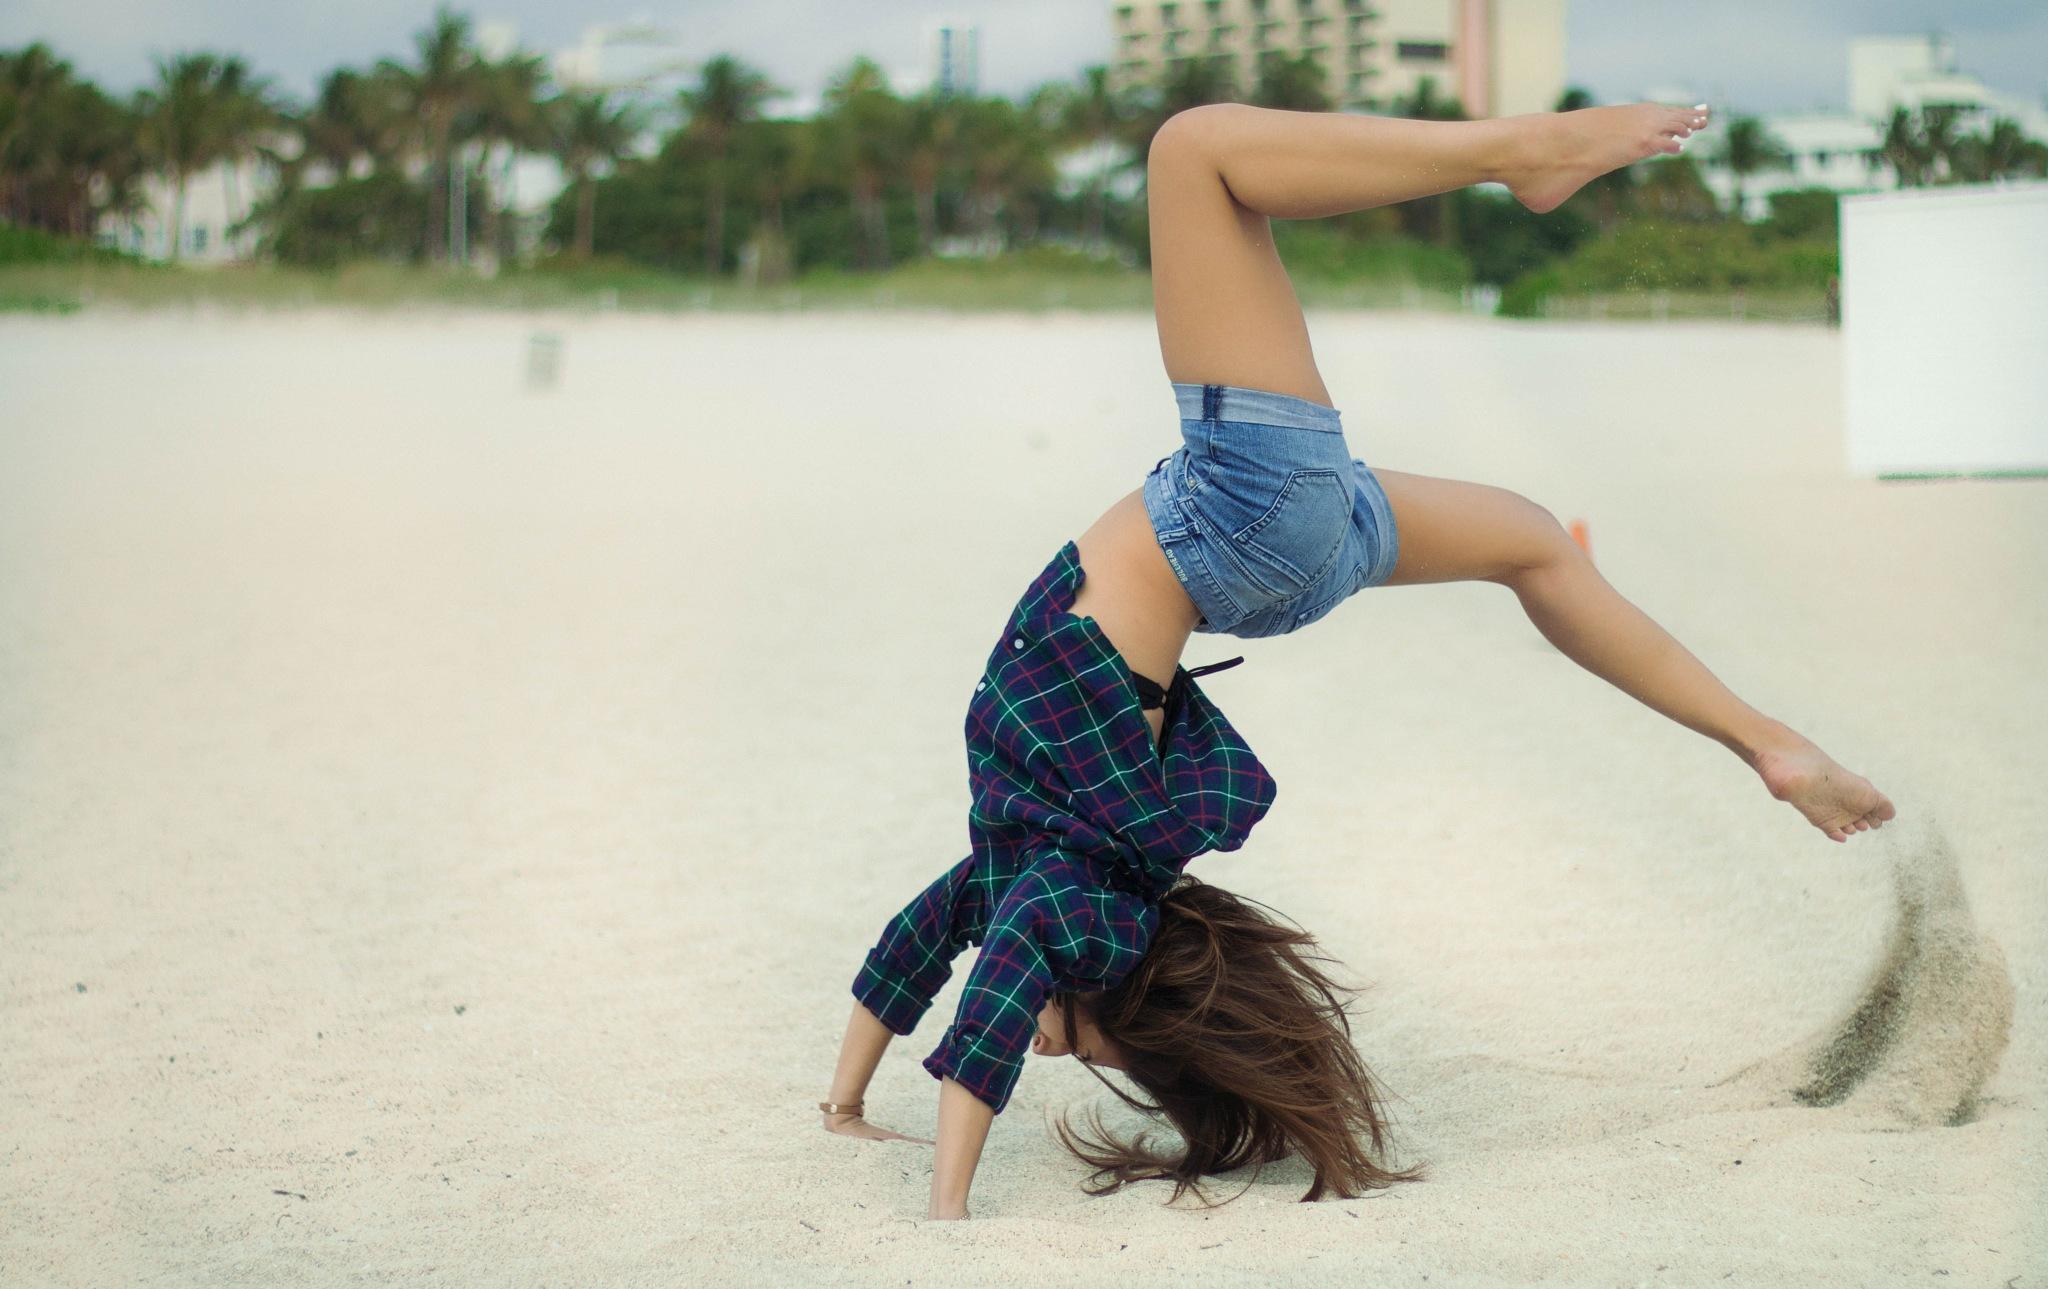 The Little Gymnast by emelysaavedra